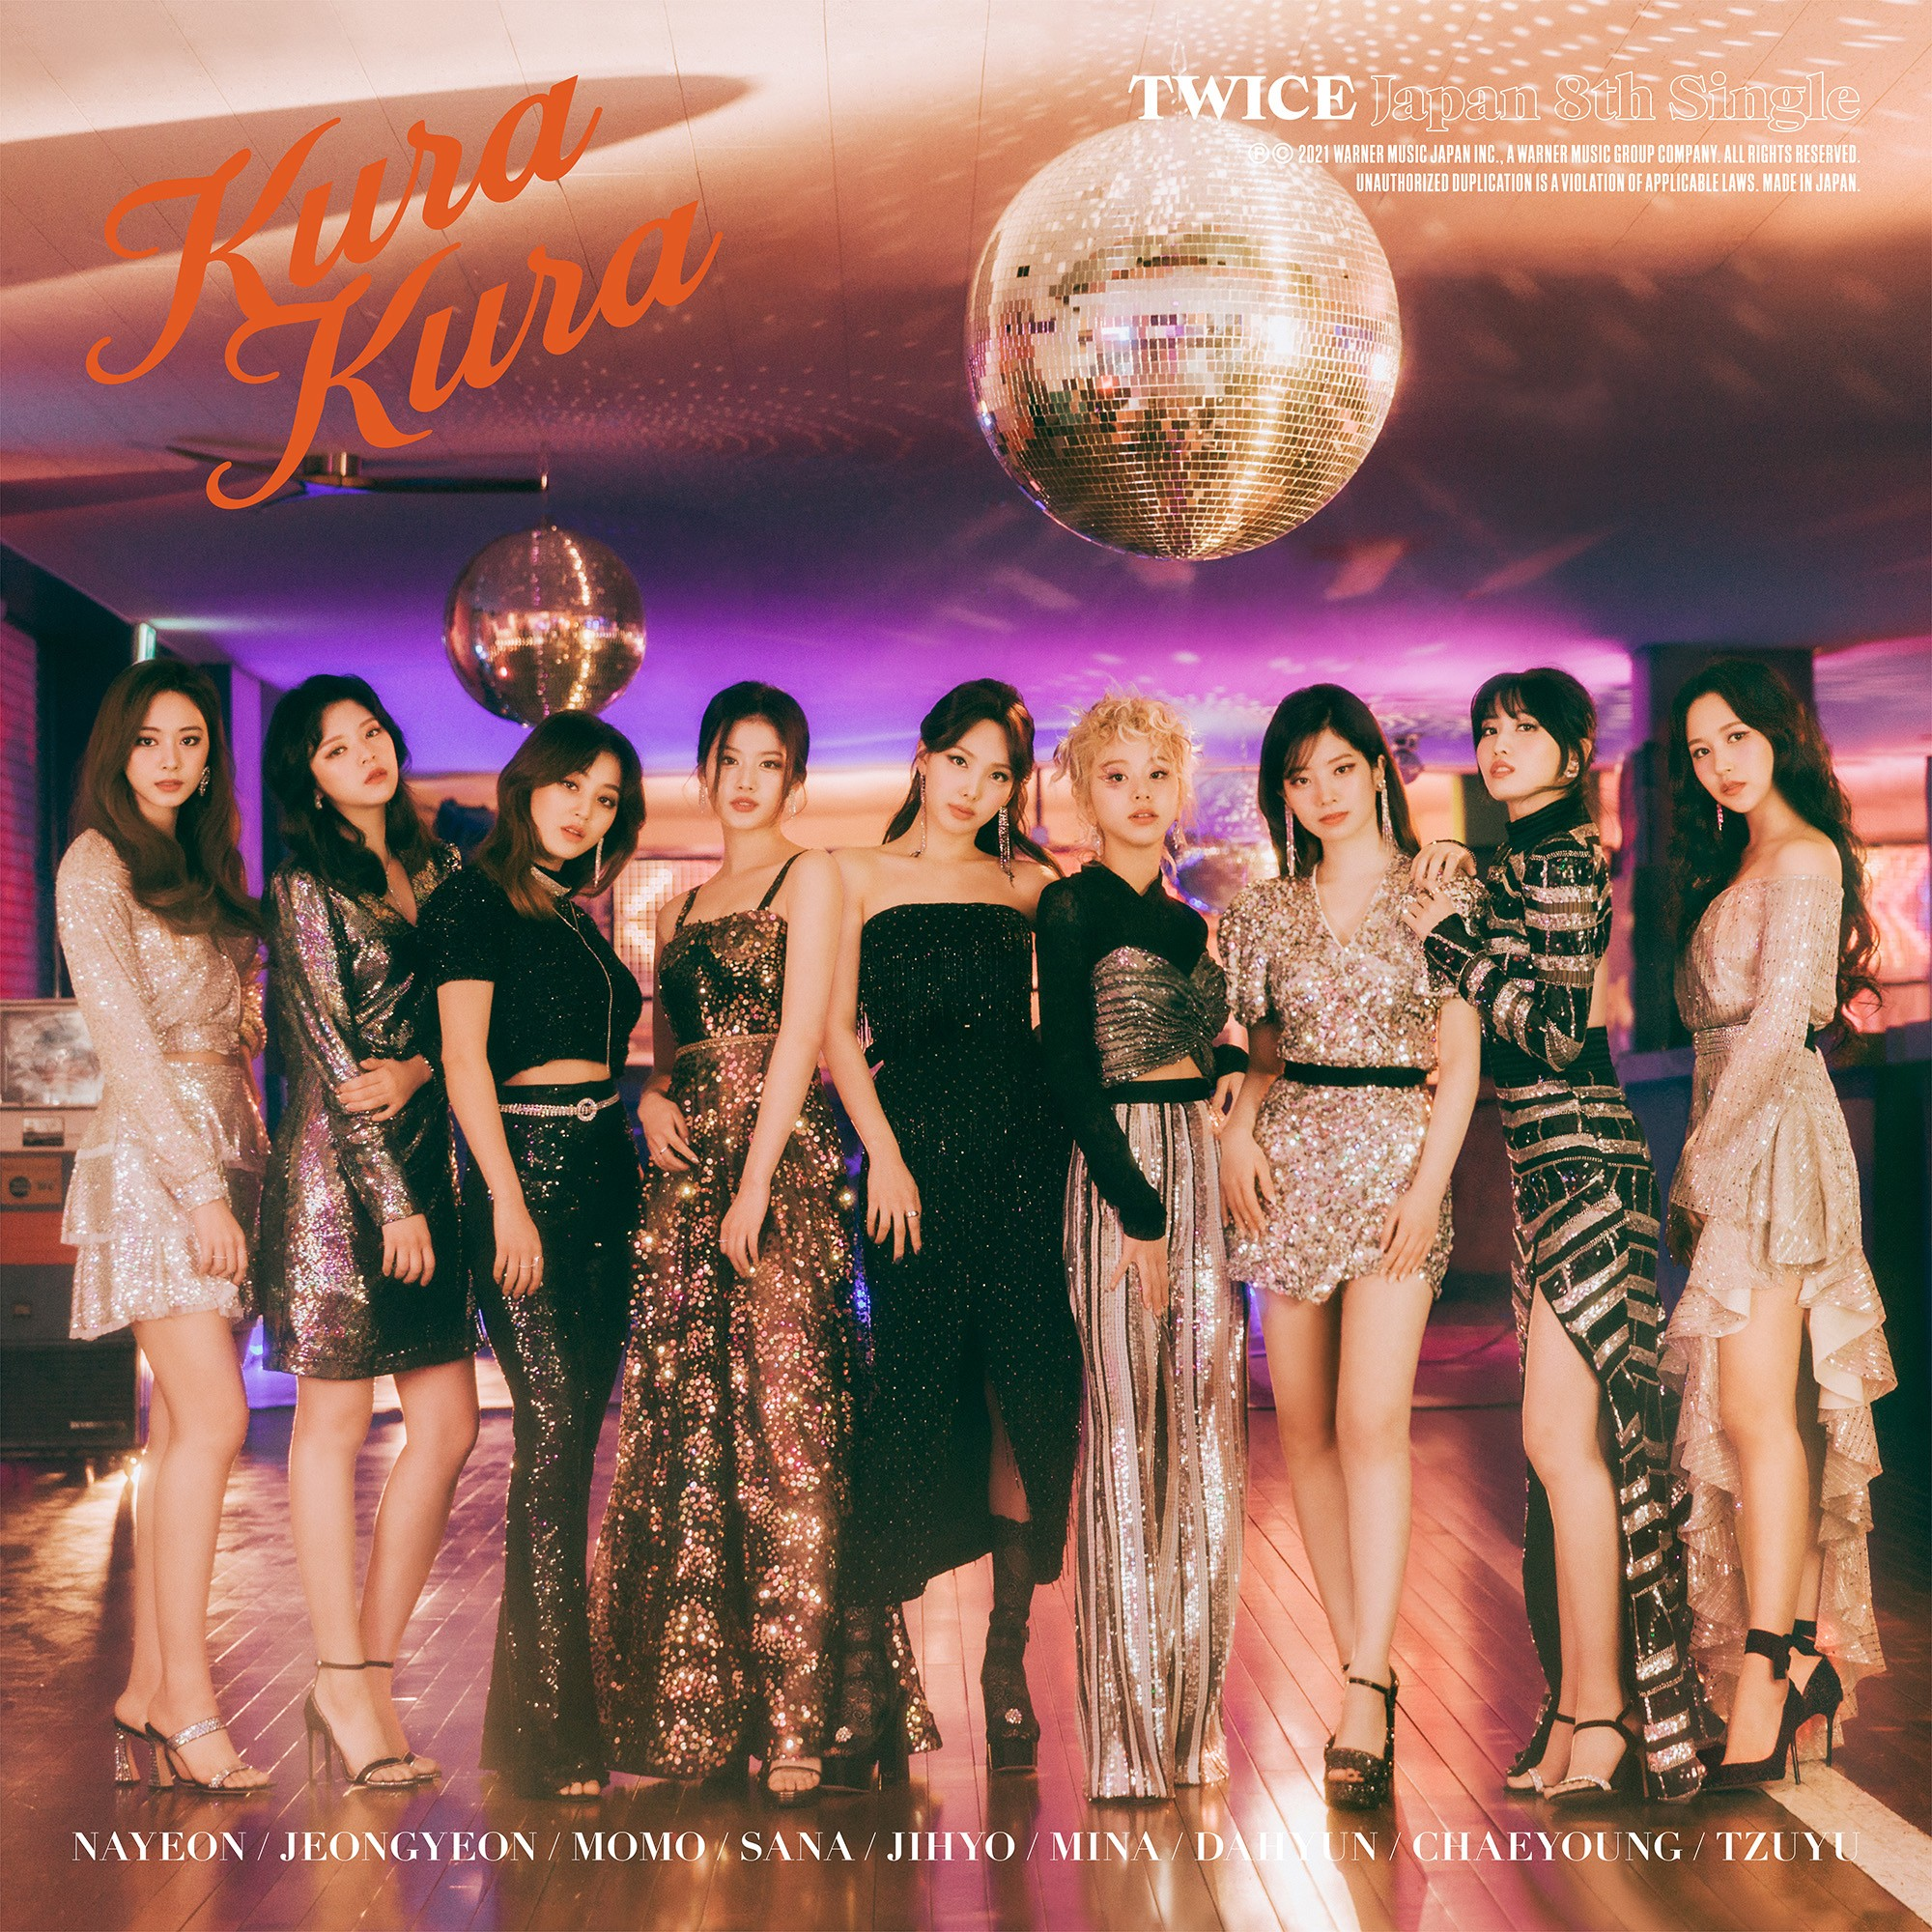 TWICE – Kura Kura [FLAC + MP3 320 / WEB] [2021.04.21]